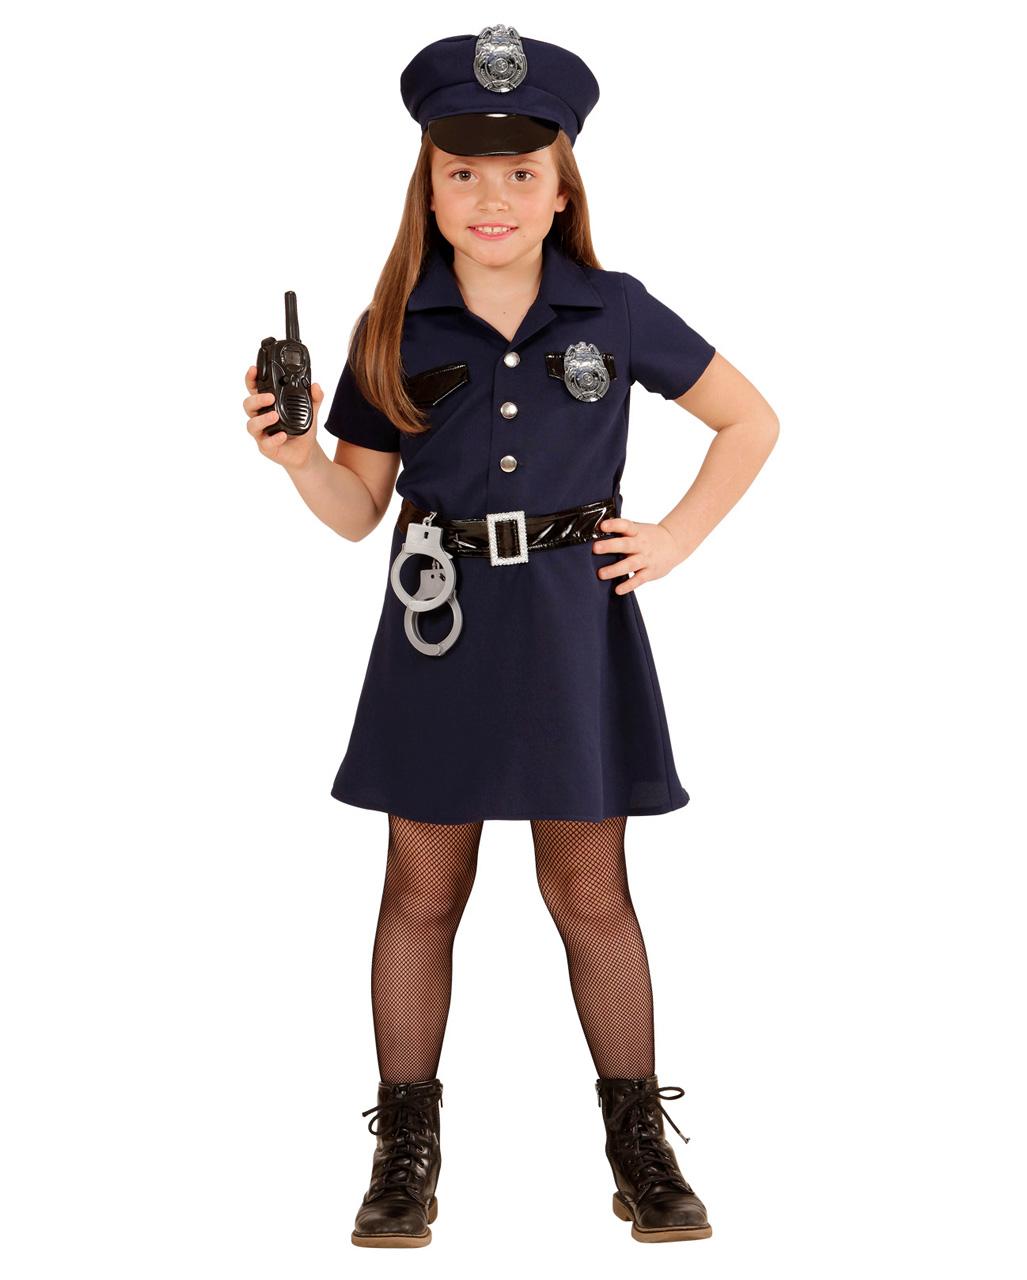 Us Polizistin Kinderkostum Fur Madchen Horror Shop Com